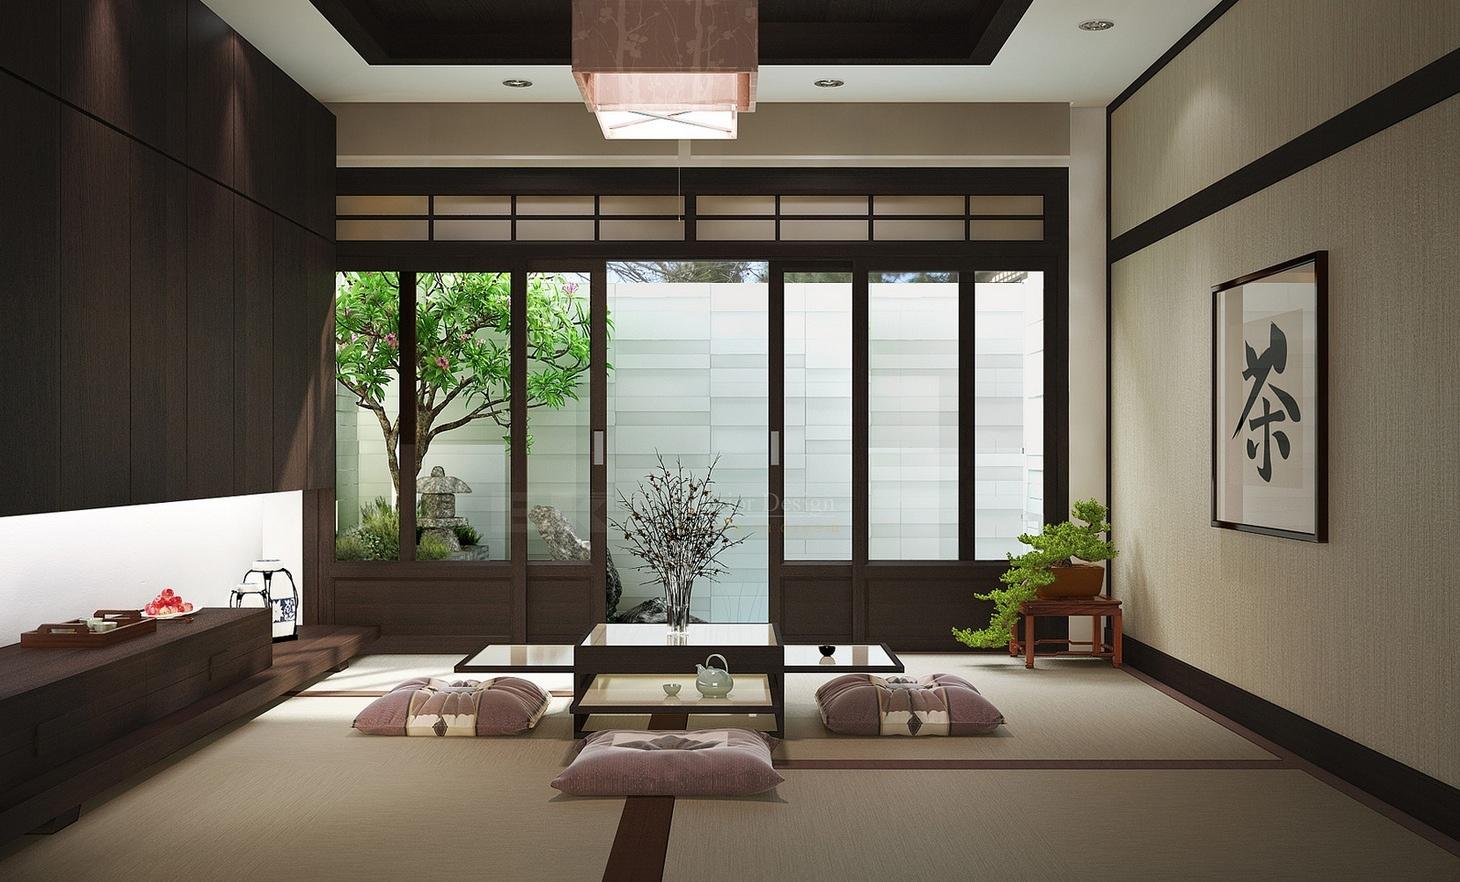 Asian style interior design rules, decor ideas and photos   Hackrea